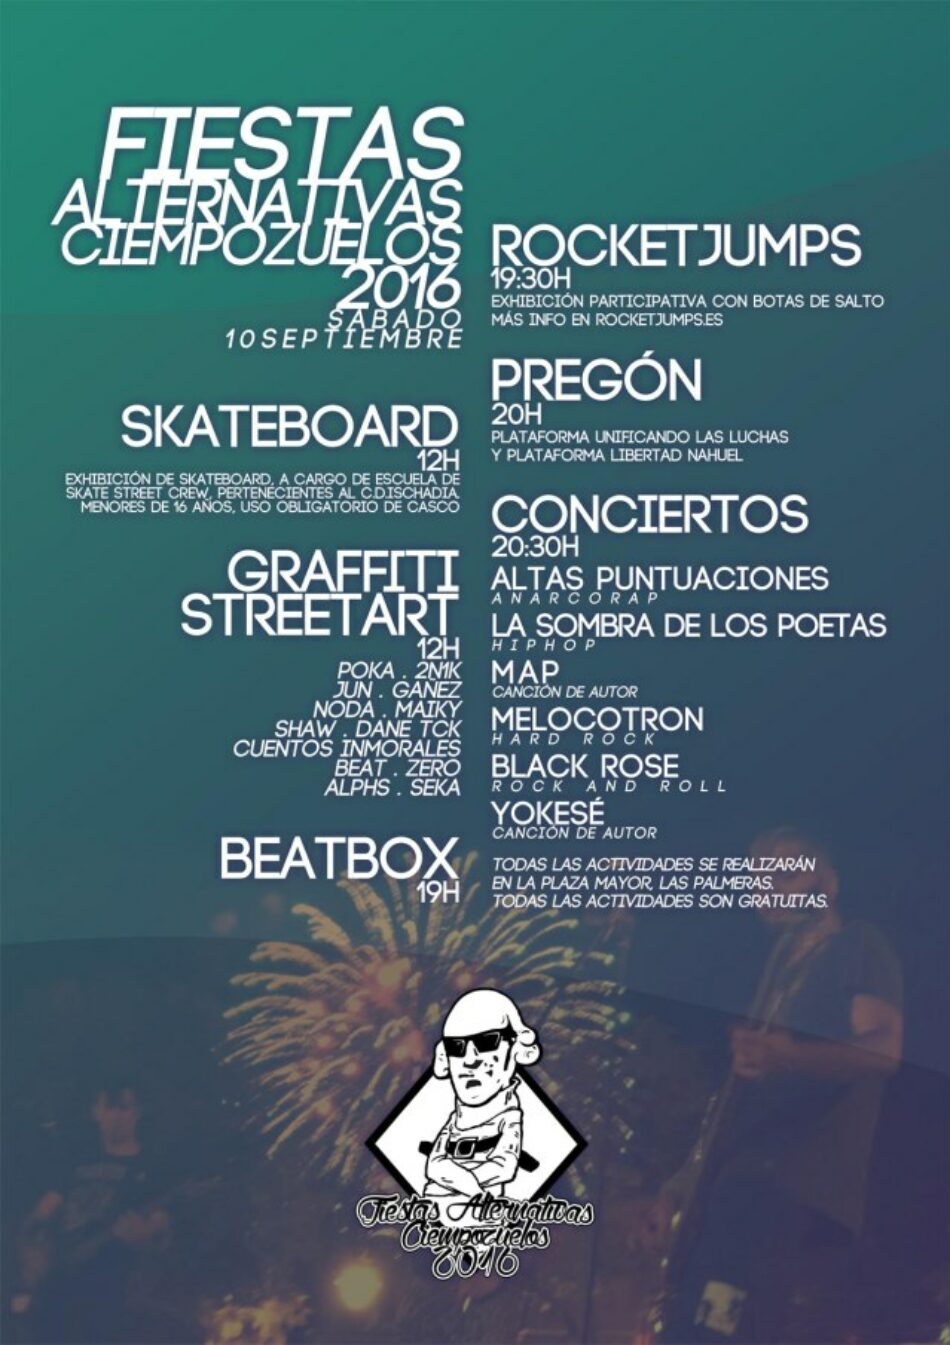 Fiestas Alternativas Ciempozuelos 2016